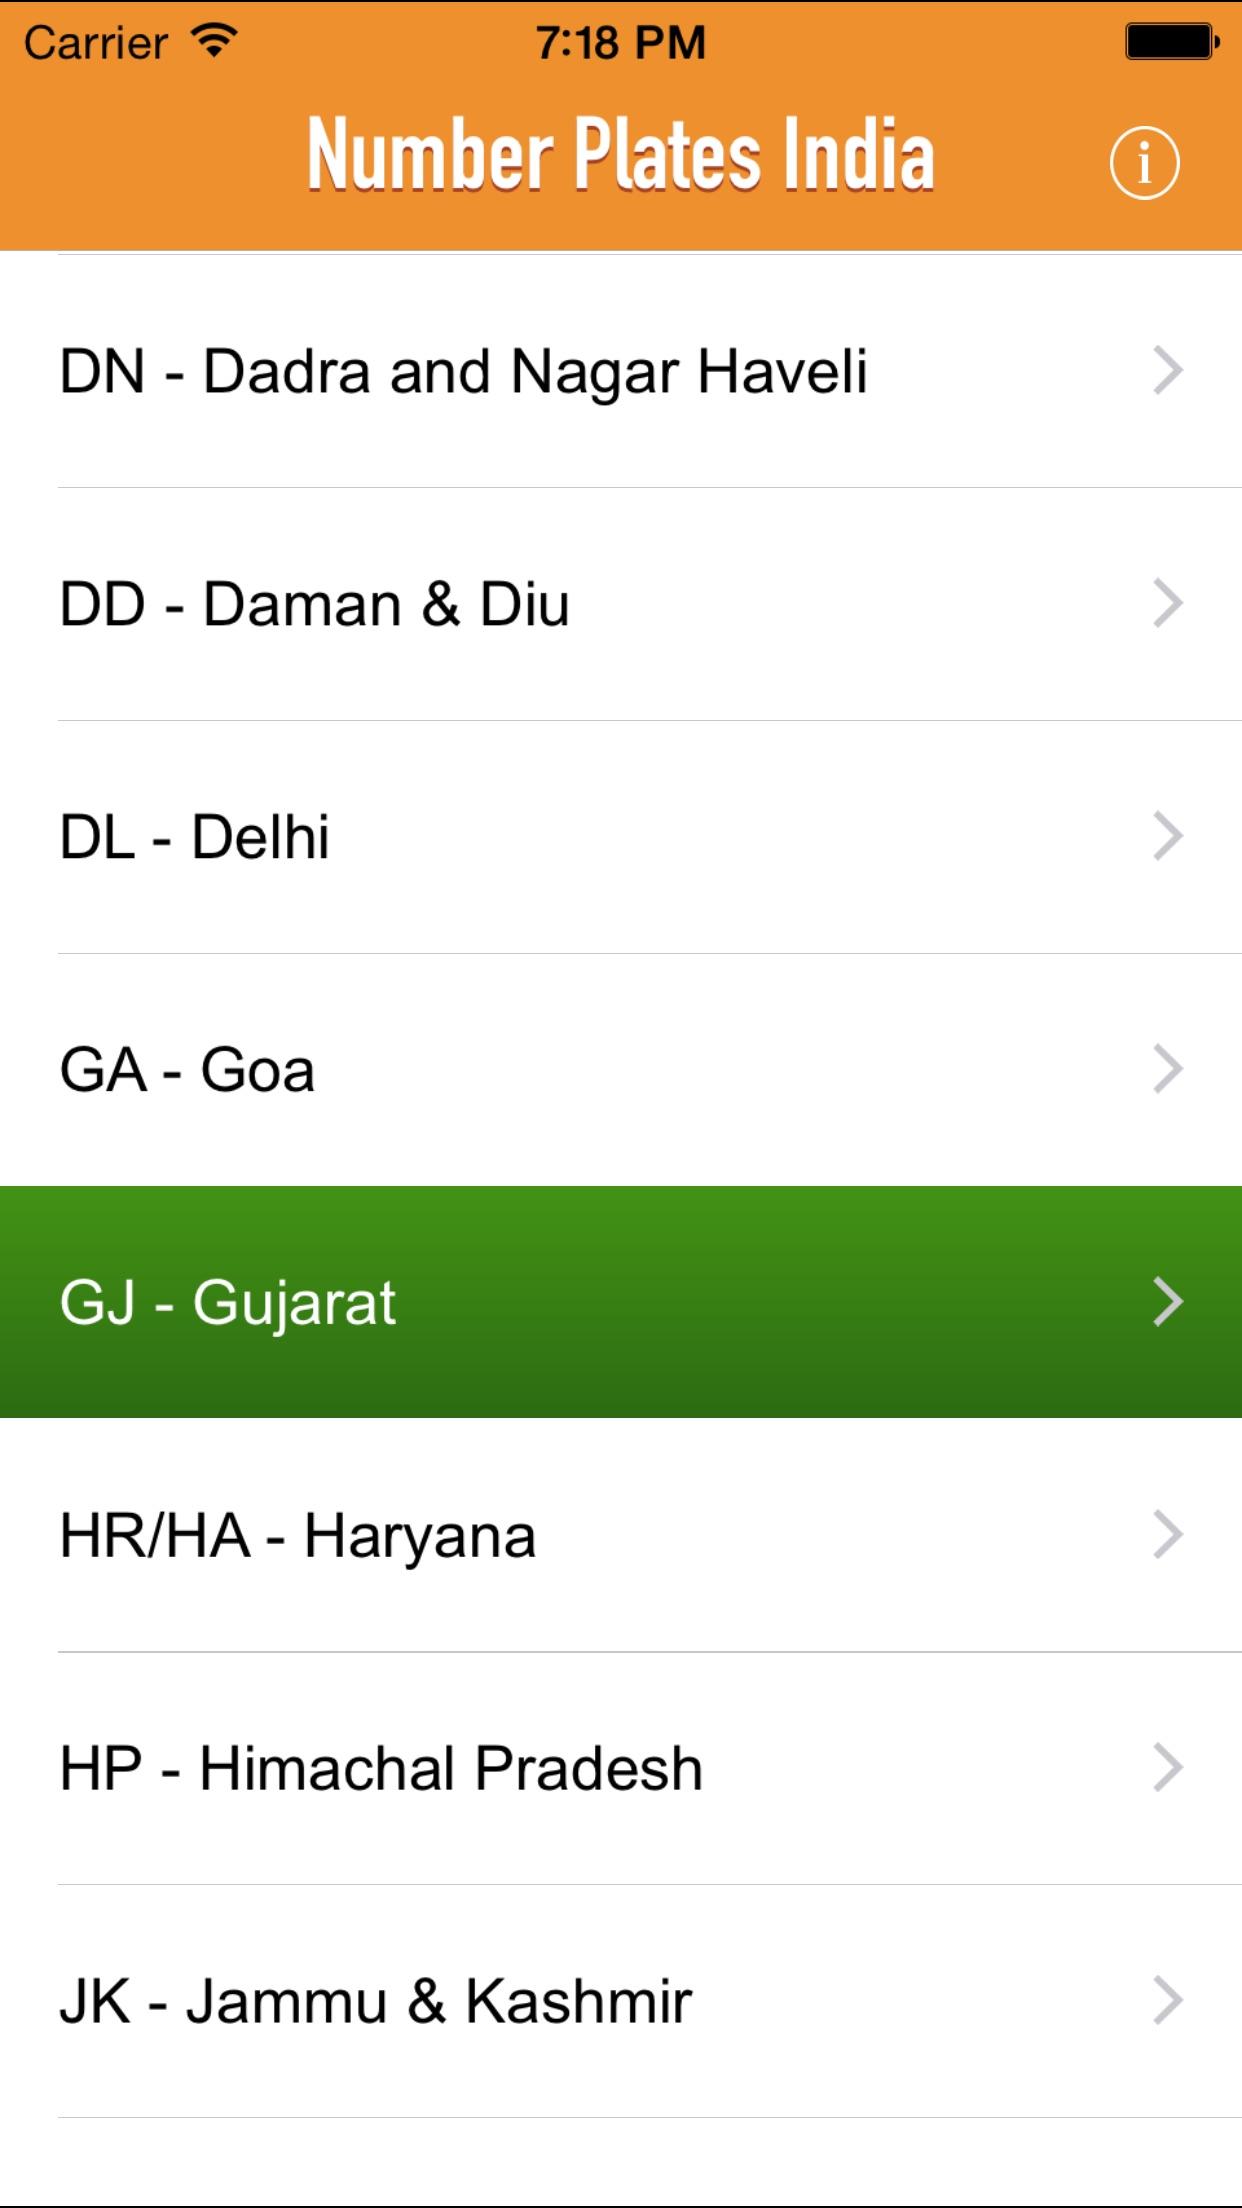 Number Plates India Screenshot